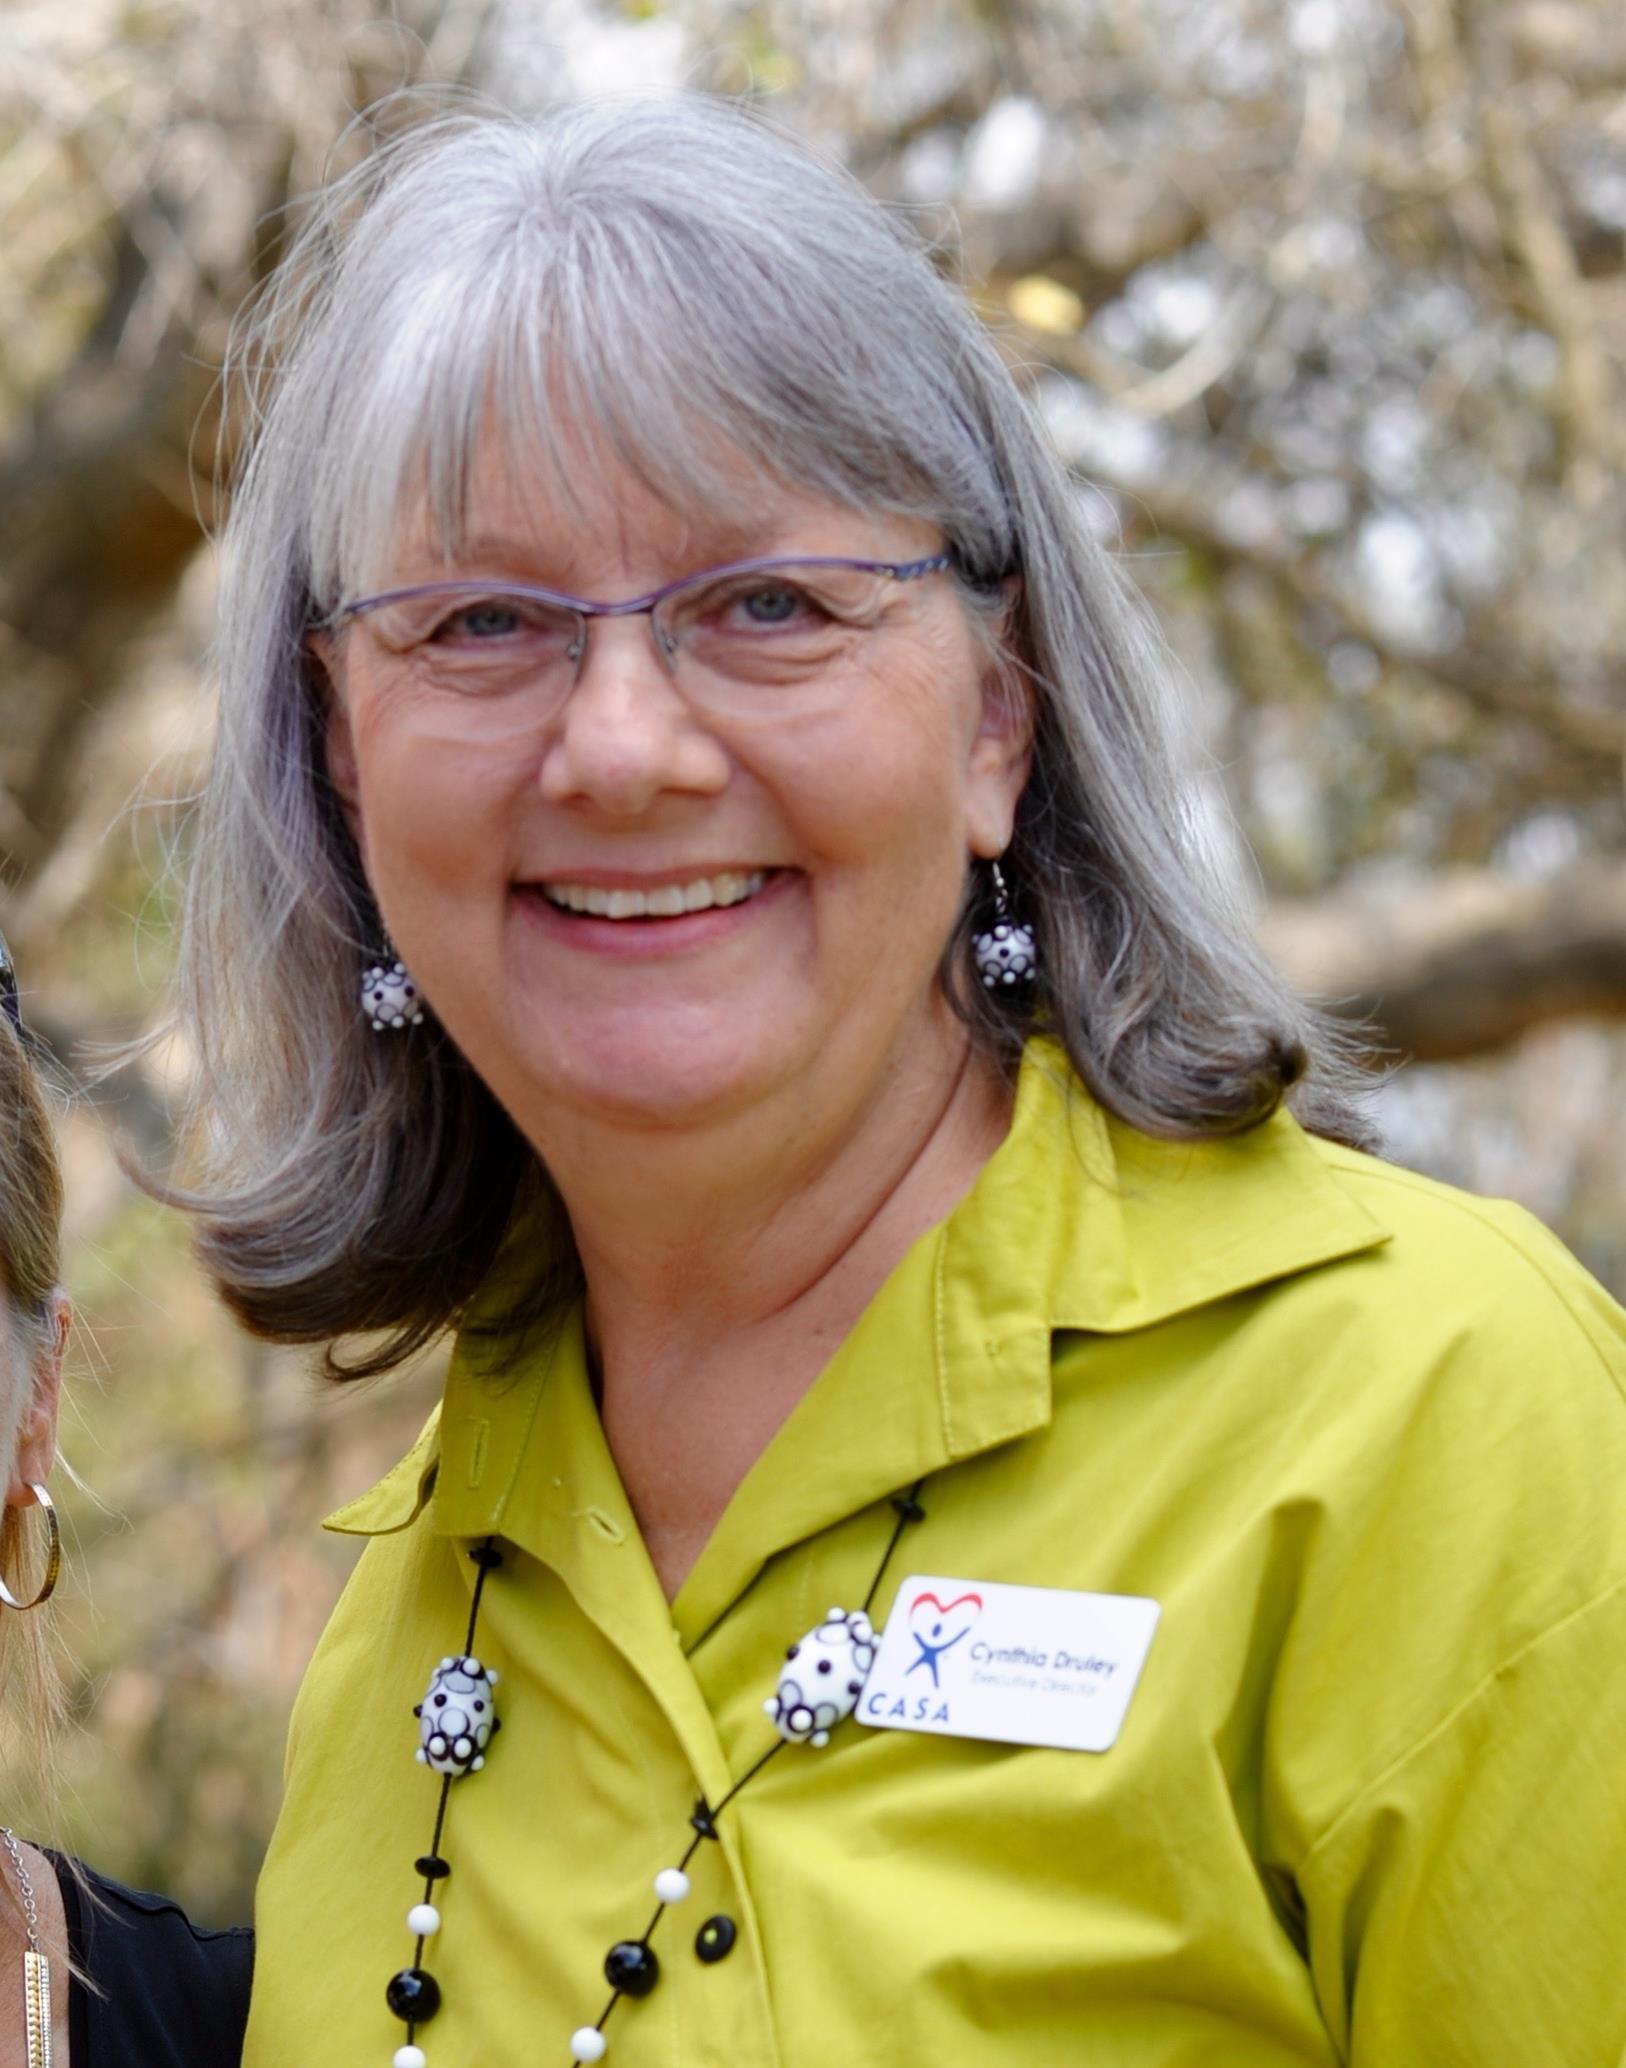 Cynthia Druley Announces Retirement